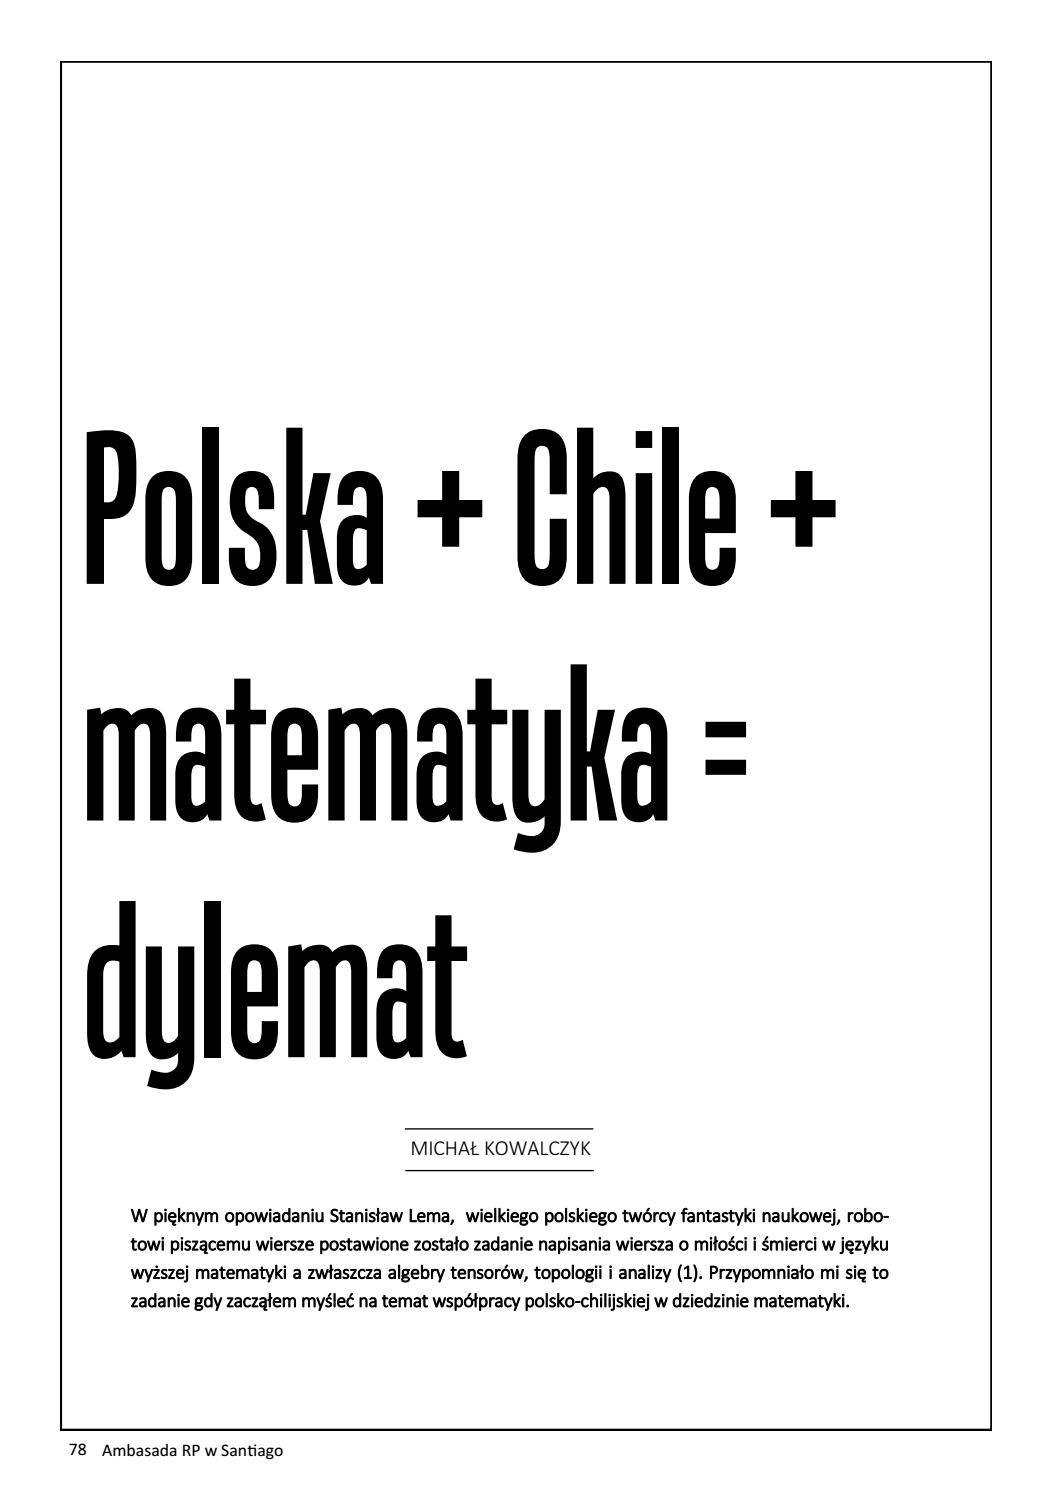 Kreatywność By Embajada De Polonia En Chile Issuu